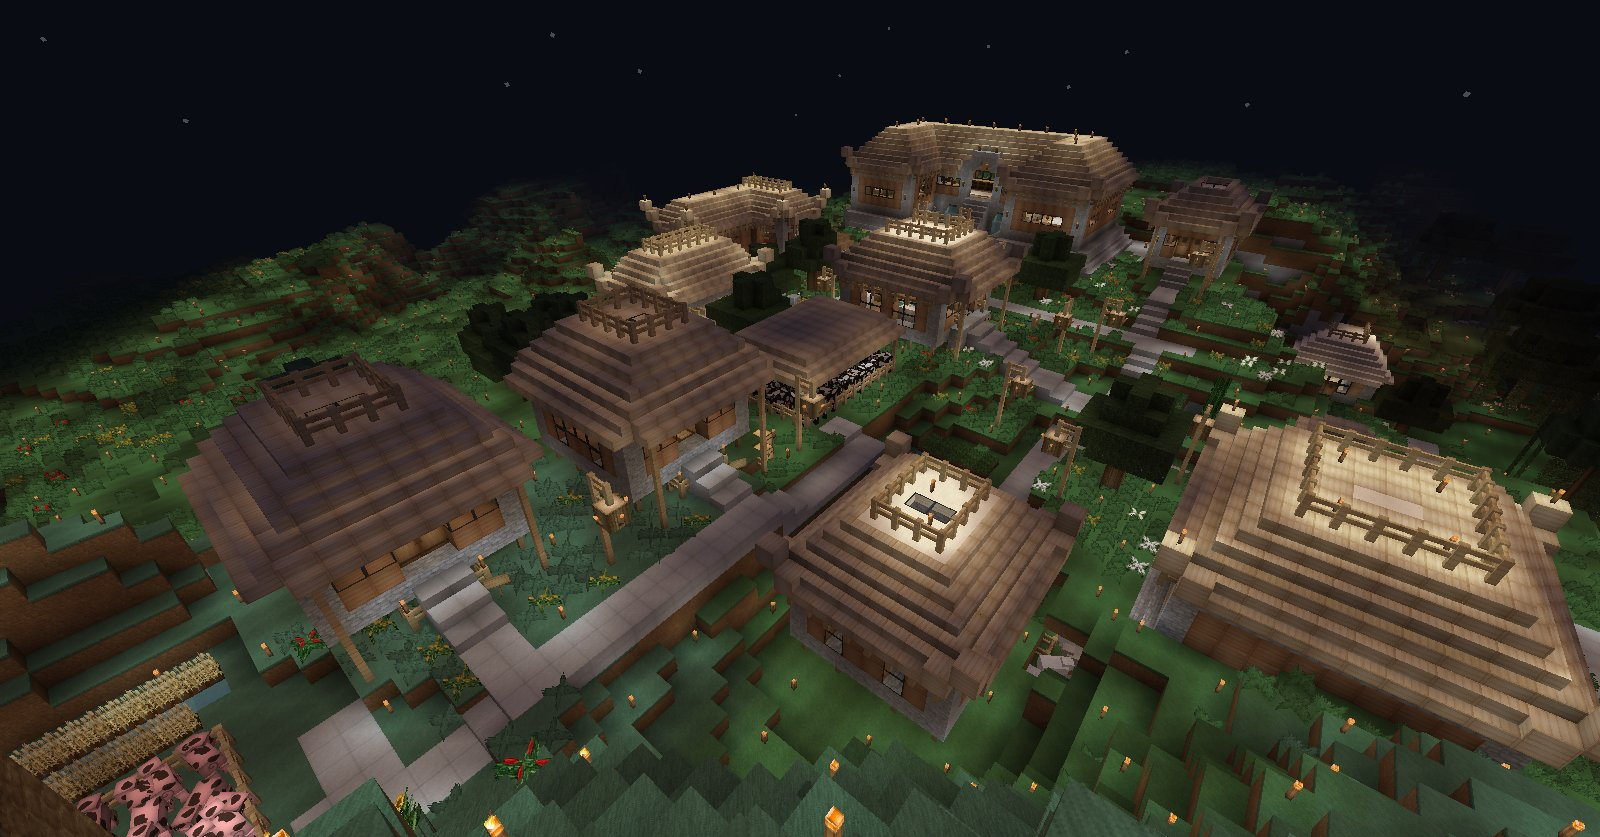 Projet village asiatique. 5deacf7a-33ca-493d-a904-9cb999b1b04f